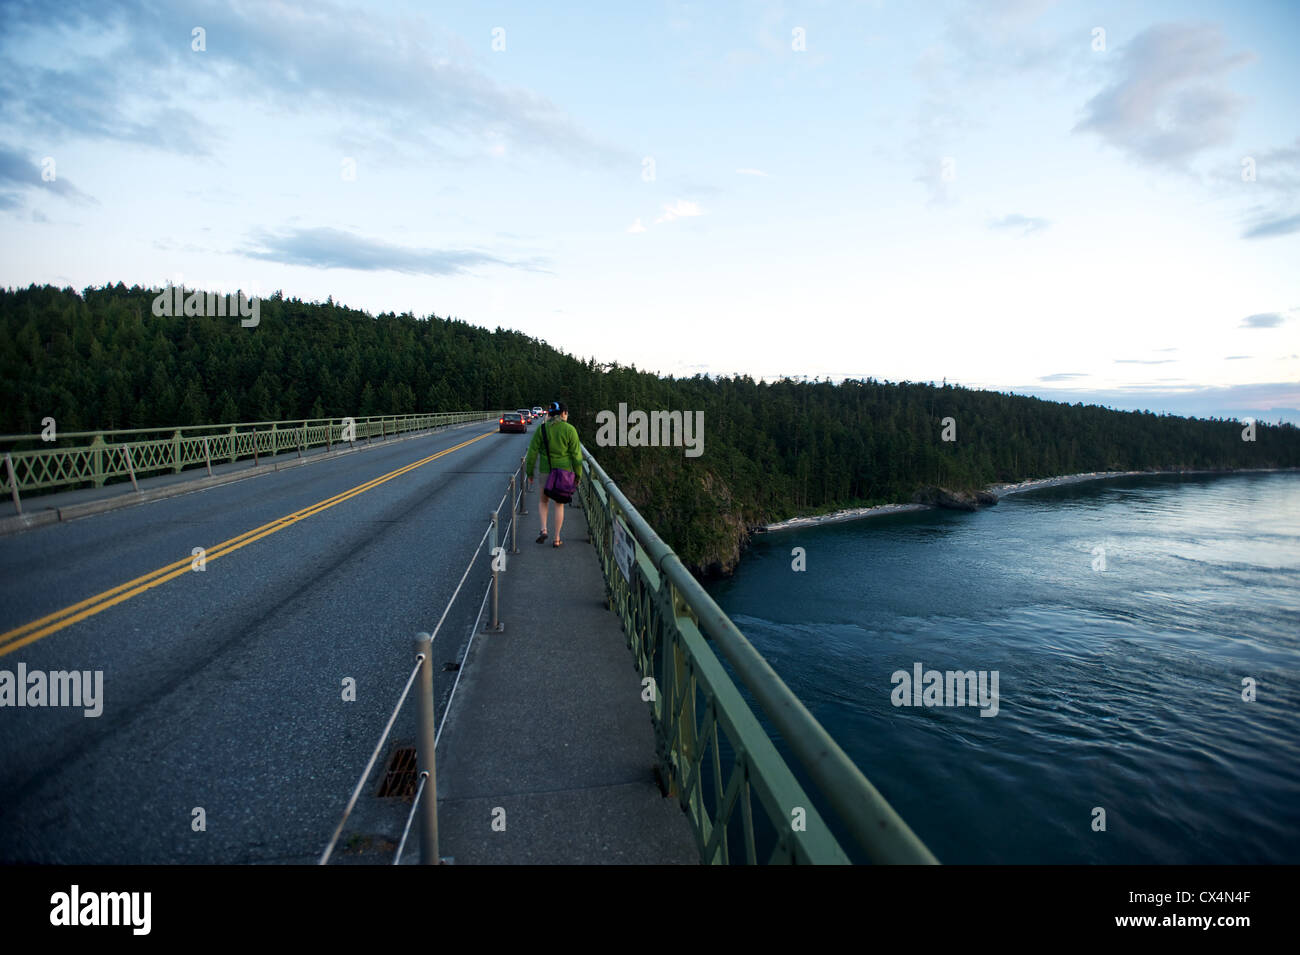 Deception Pass Bridge. Whidbey Island. Olympic Peninsula, Washington State, USA - Stock Image